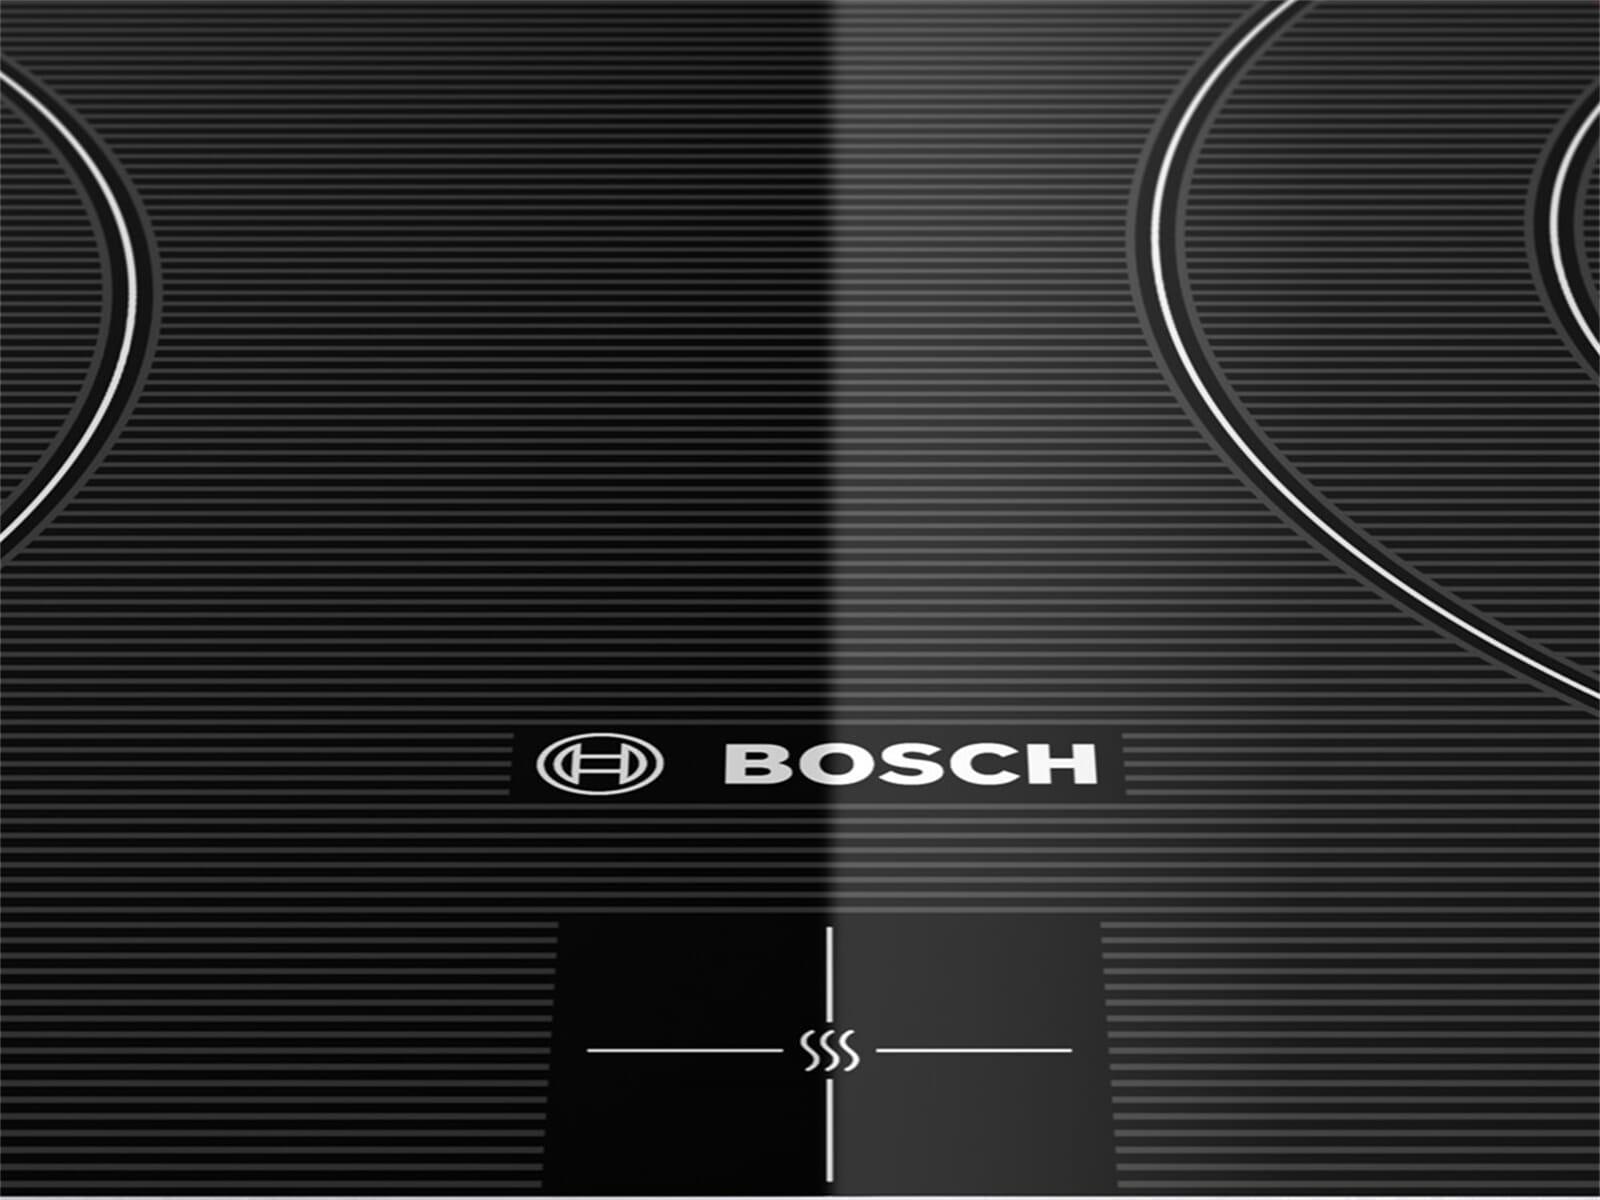 Bosch NKN645G17 Glaskeramikkochfeld herdgebunden